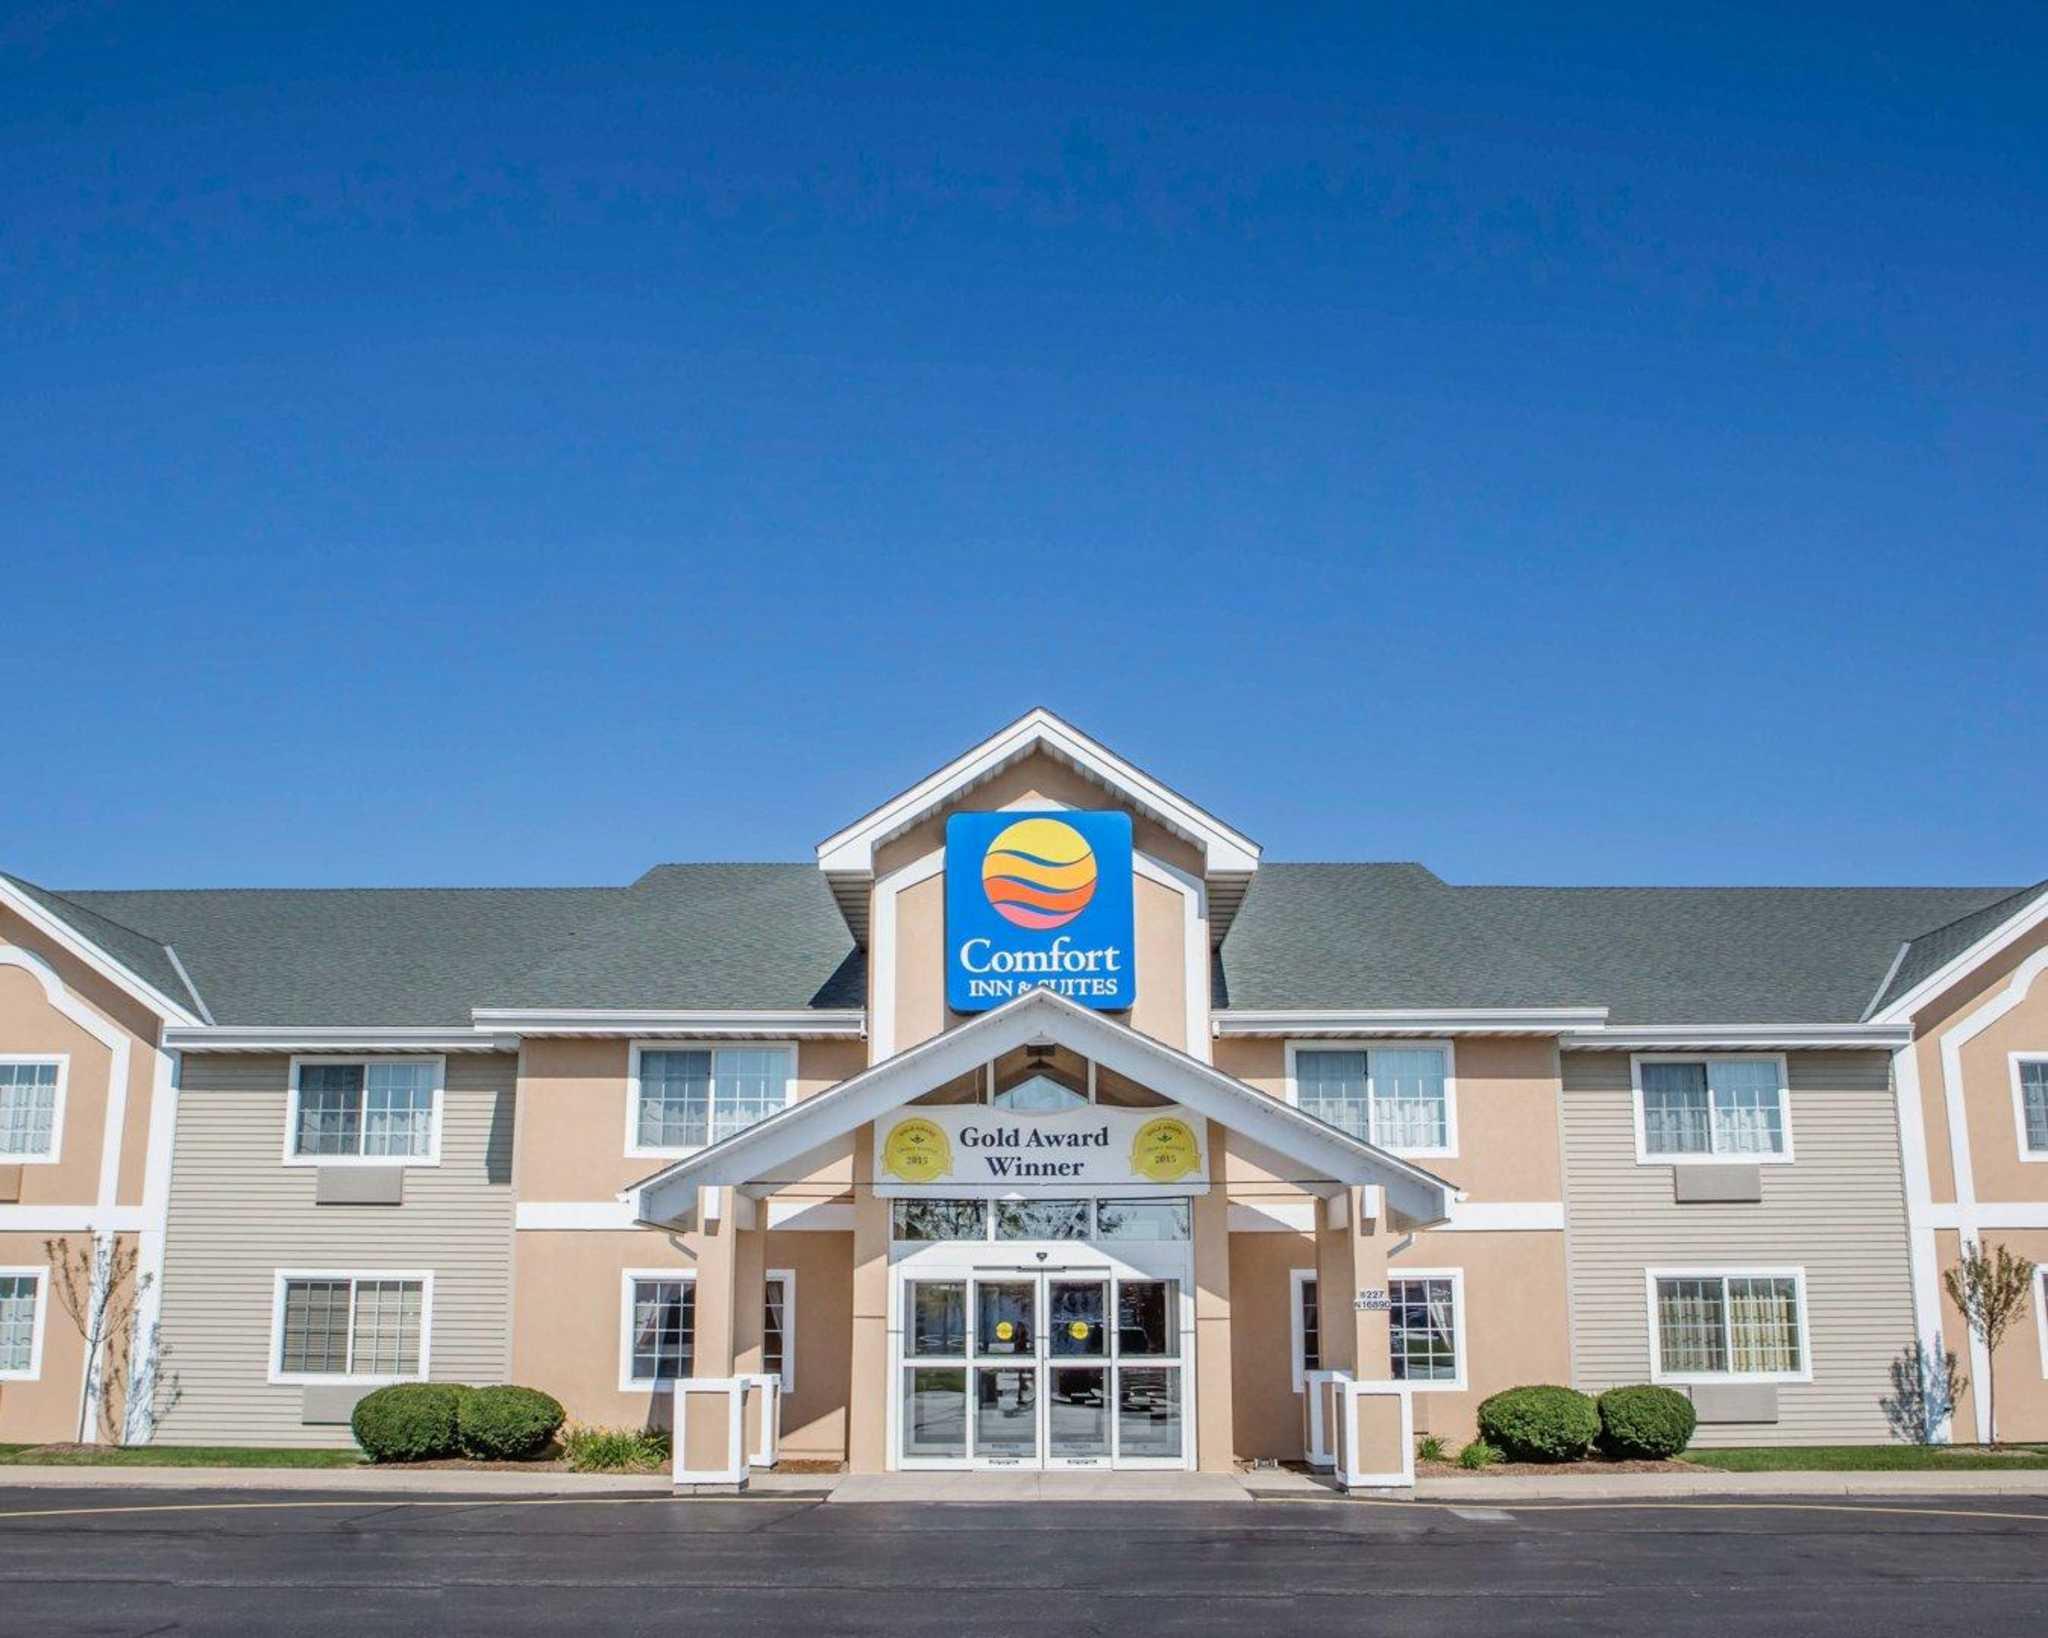 Comfort Inn & Suites Jackson - West Bend image 0